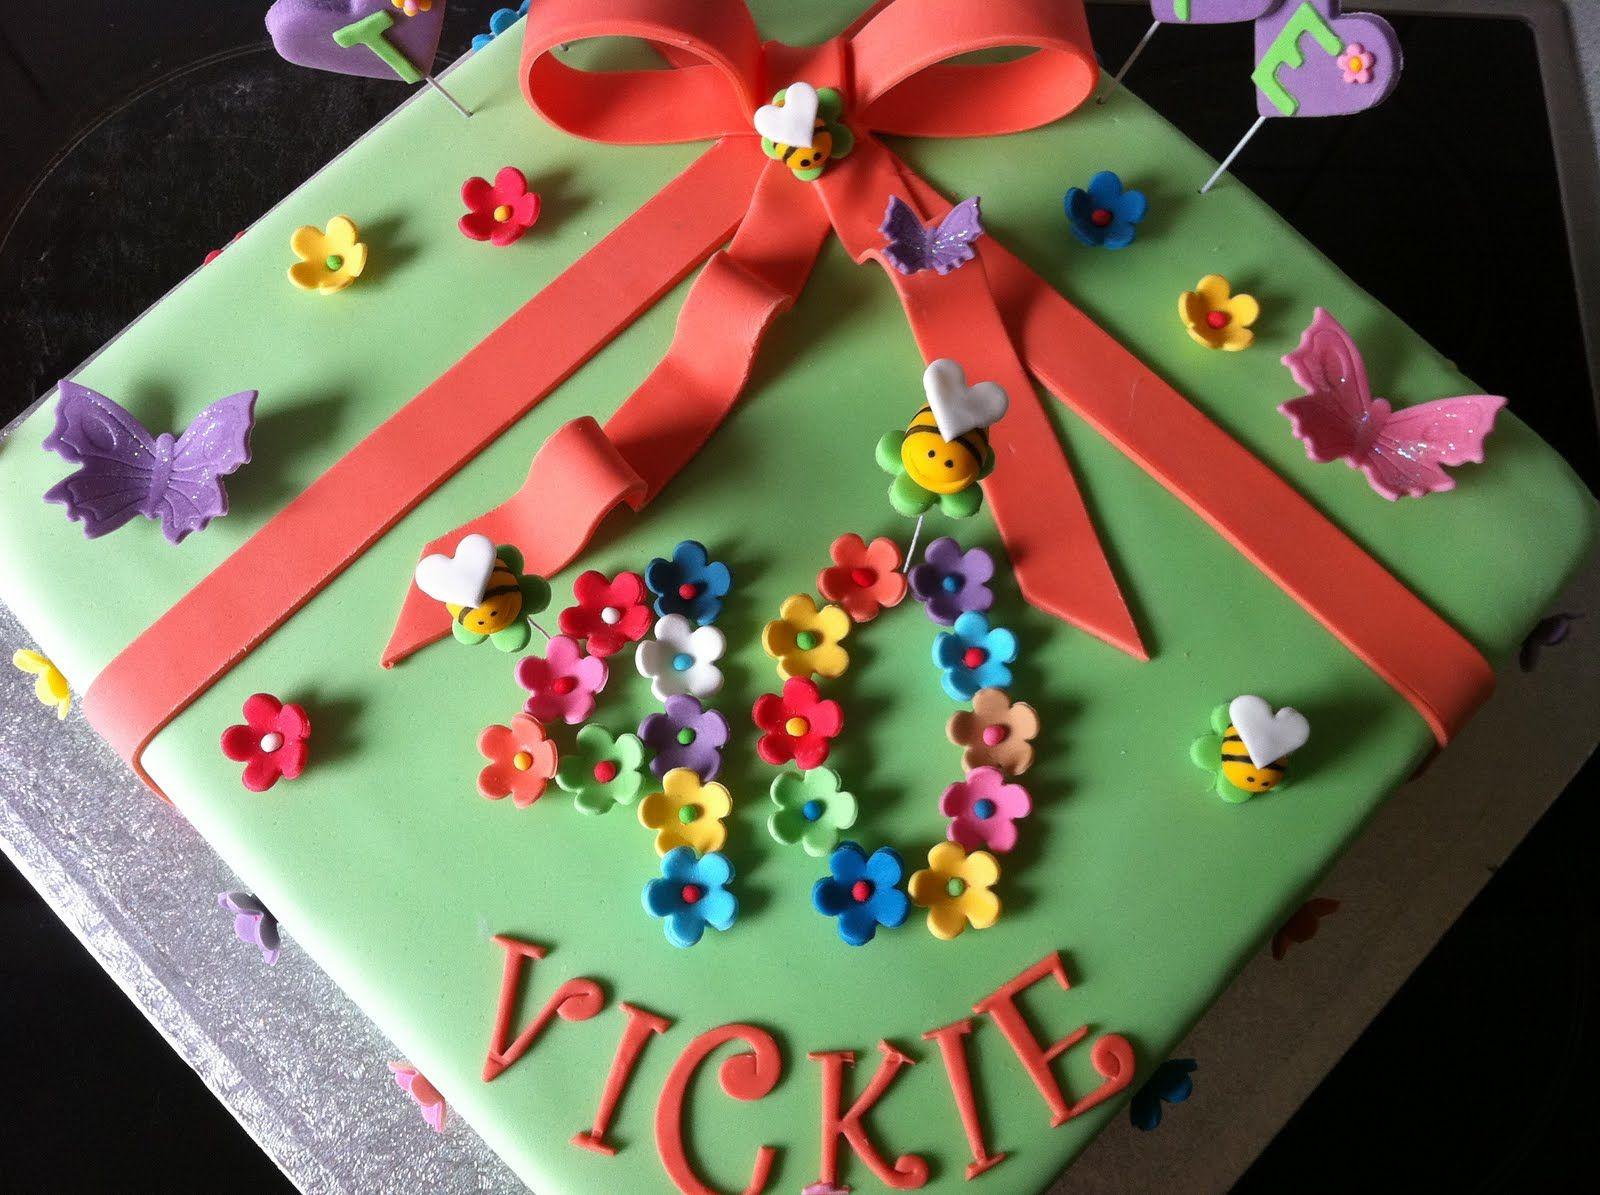 Happy Birthday Vicki Hollys Cakes Happy Birthday Vickie Vickie